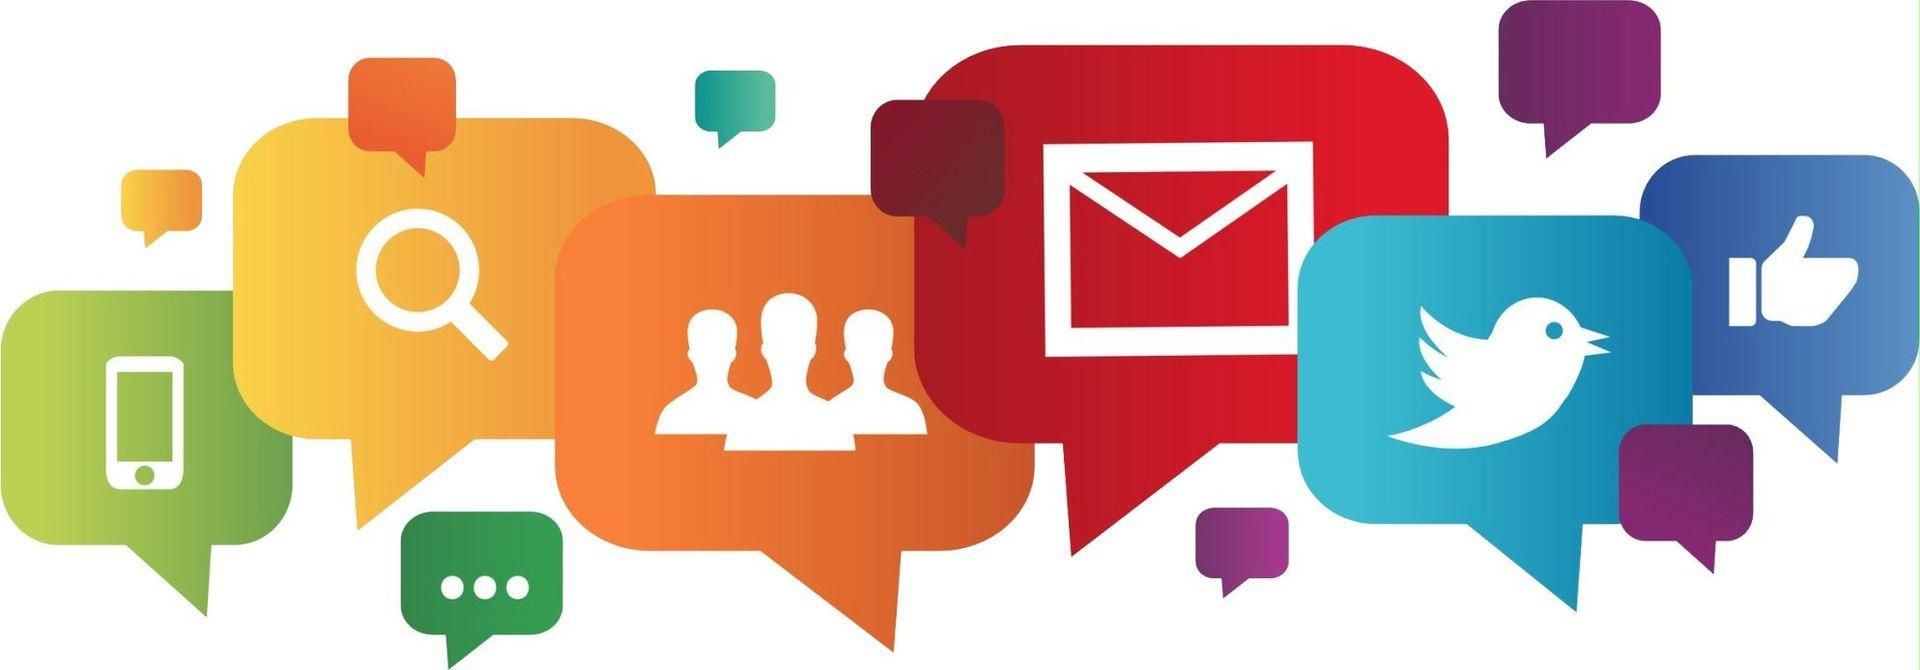 digital-marketing-blog-digital-marketing